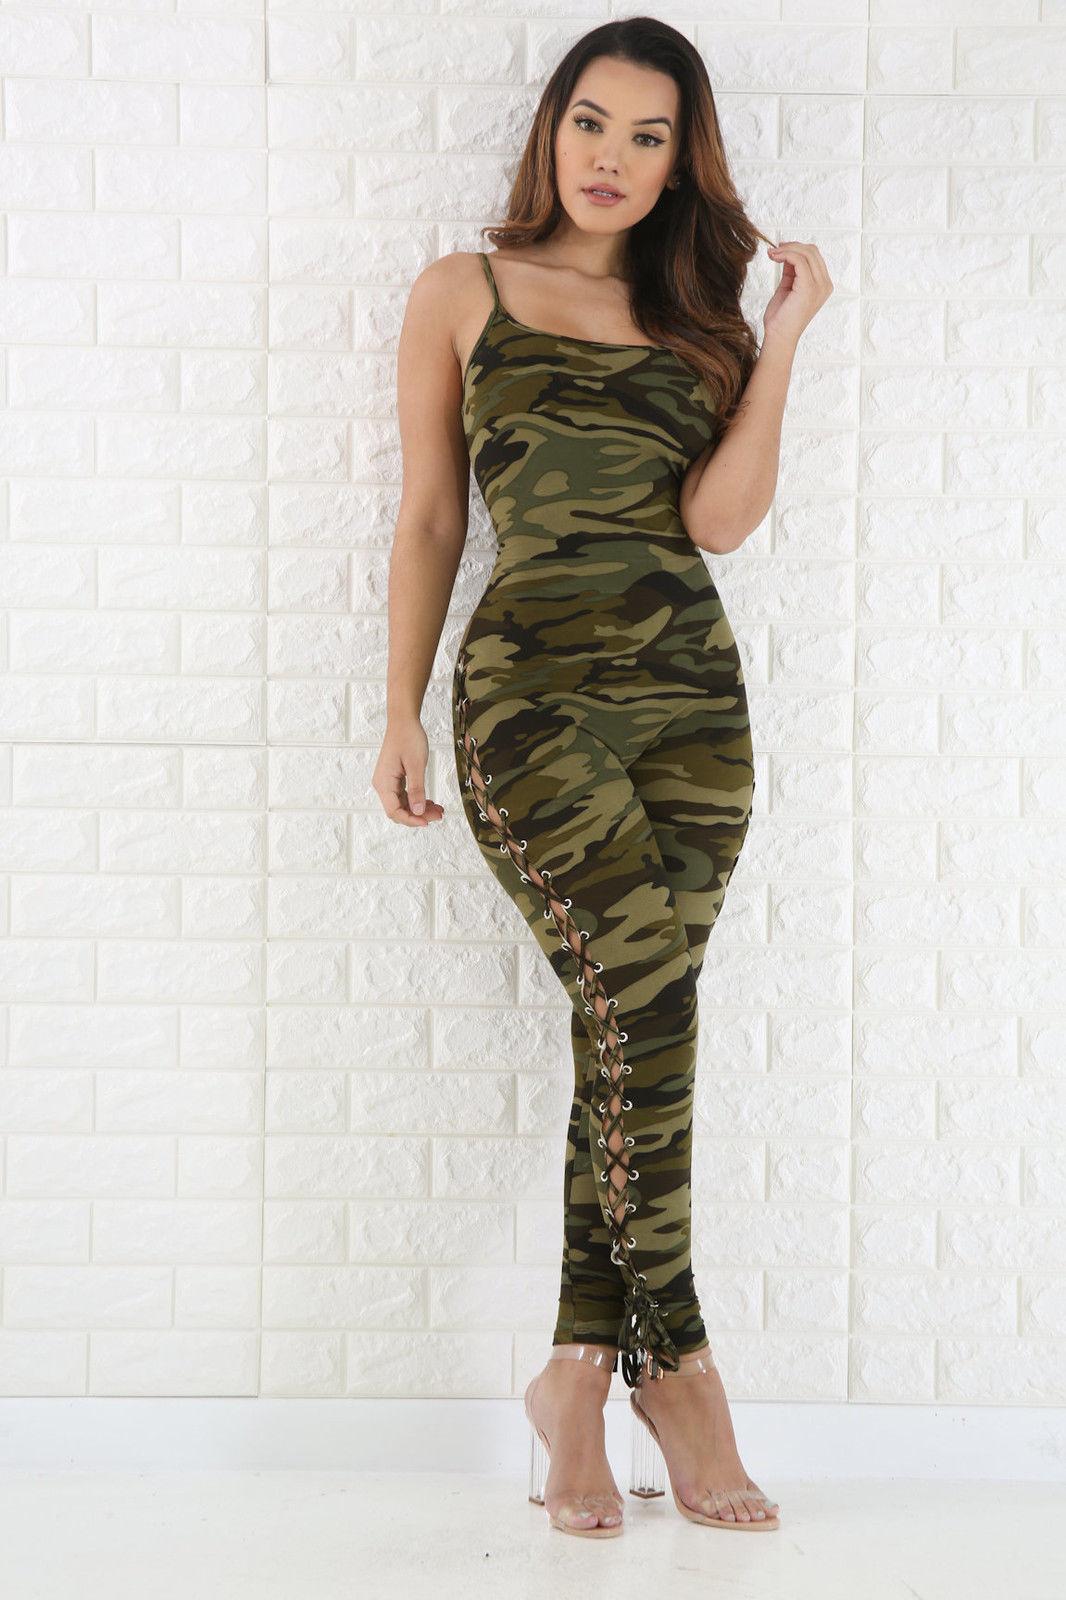 2017 Frauen V-ausschnitt Camouflage Print Overall Damen Abend Nightout Party Side Lace Up Overall Um 50 Prozent Reduziert